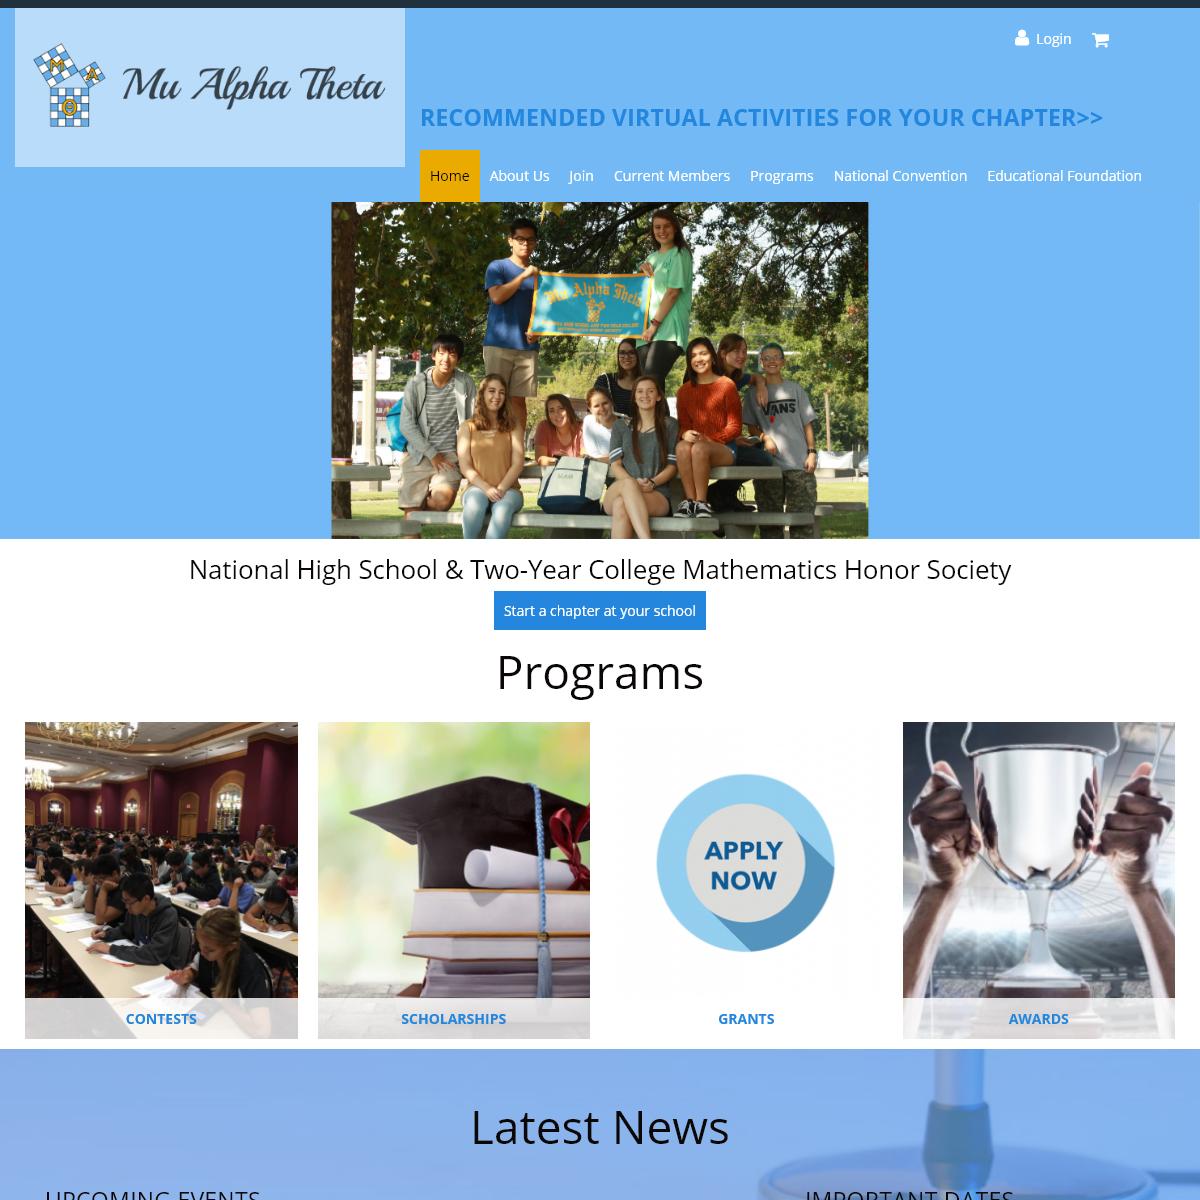 Mu Alpha Theta - National High School & Two-Year College Mathematics Honor Society